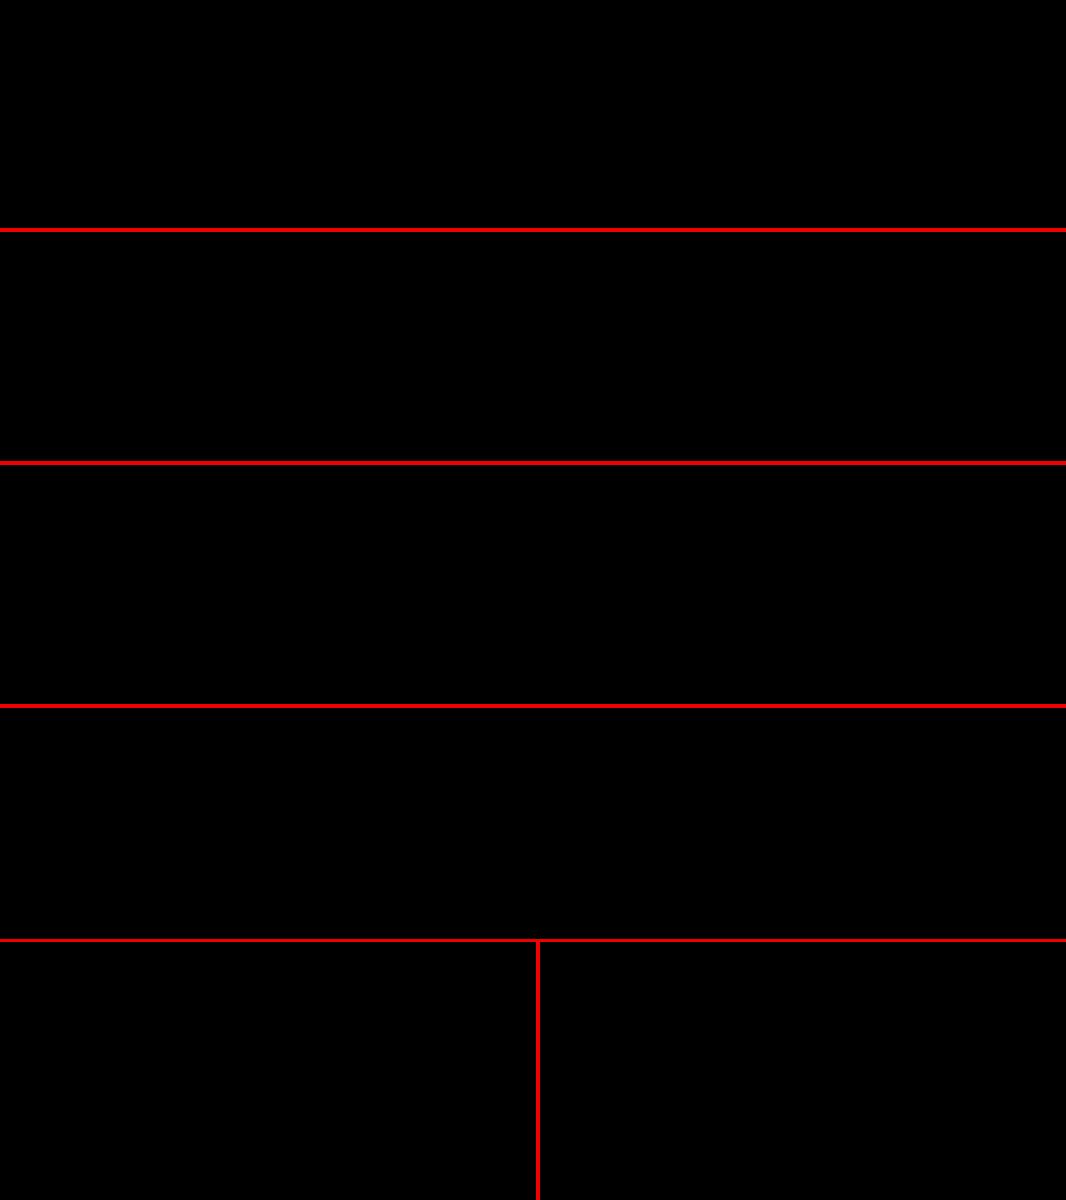 File Ugaritic Alphabet Chart Arabic Svg Wikimedia Commons Persian Tattoo Persian Calligraphy Art Alphabet Charts